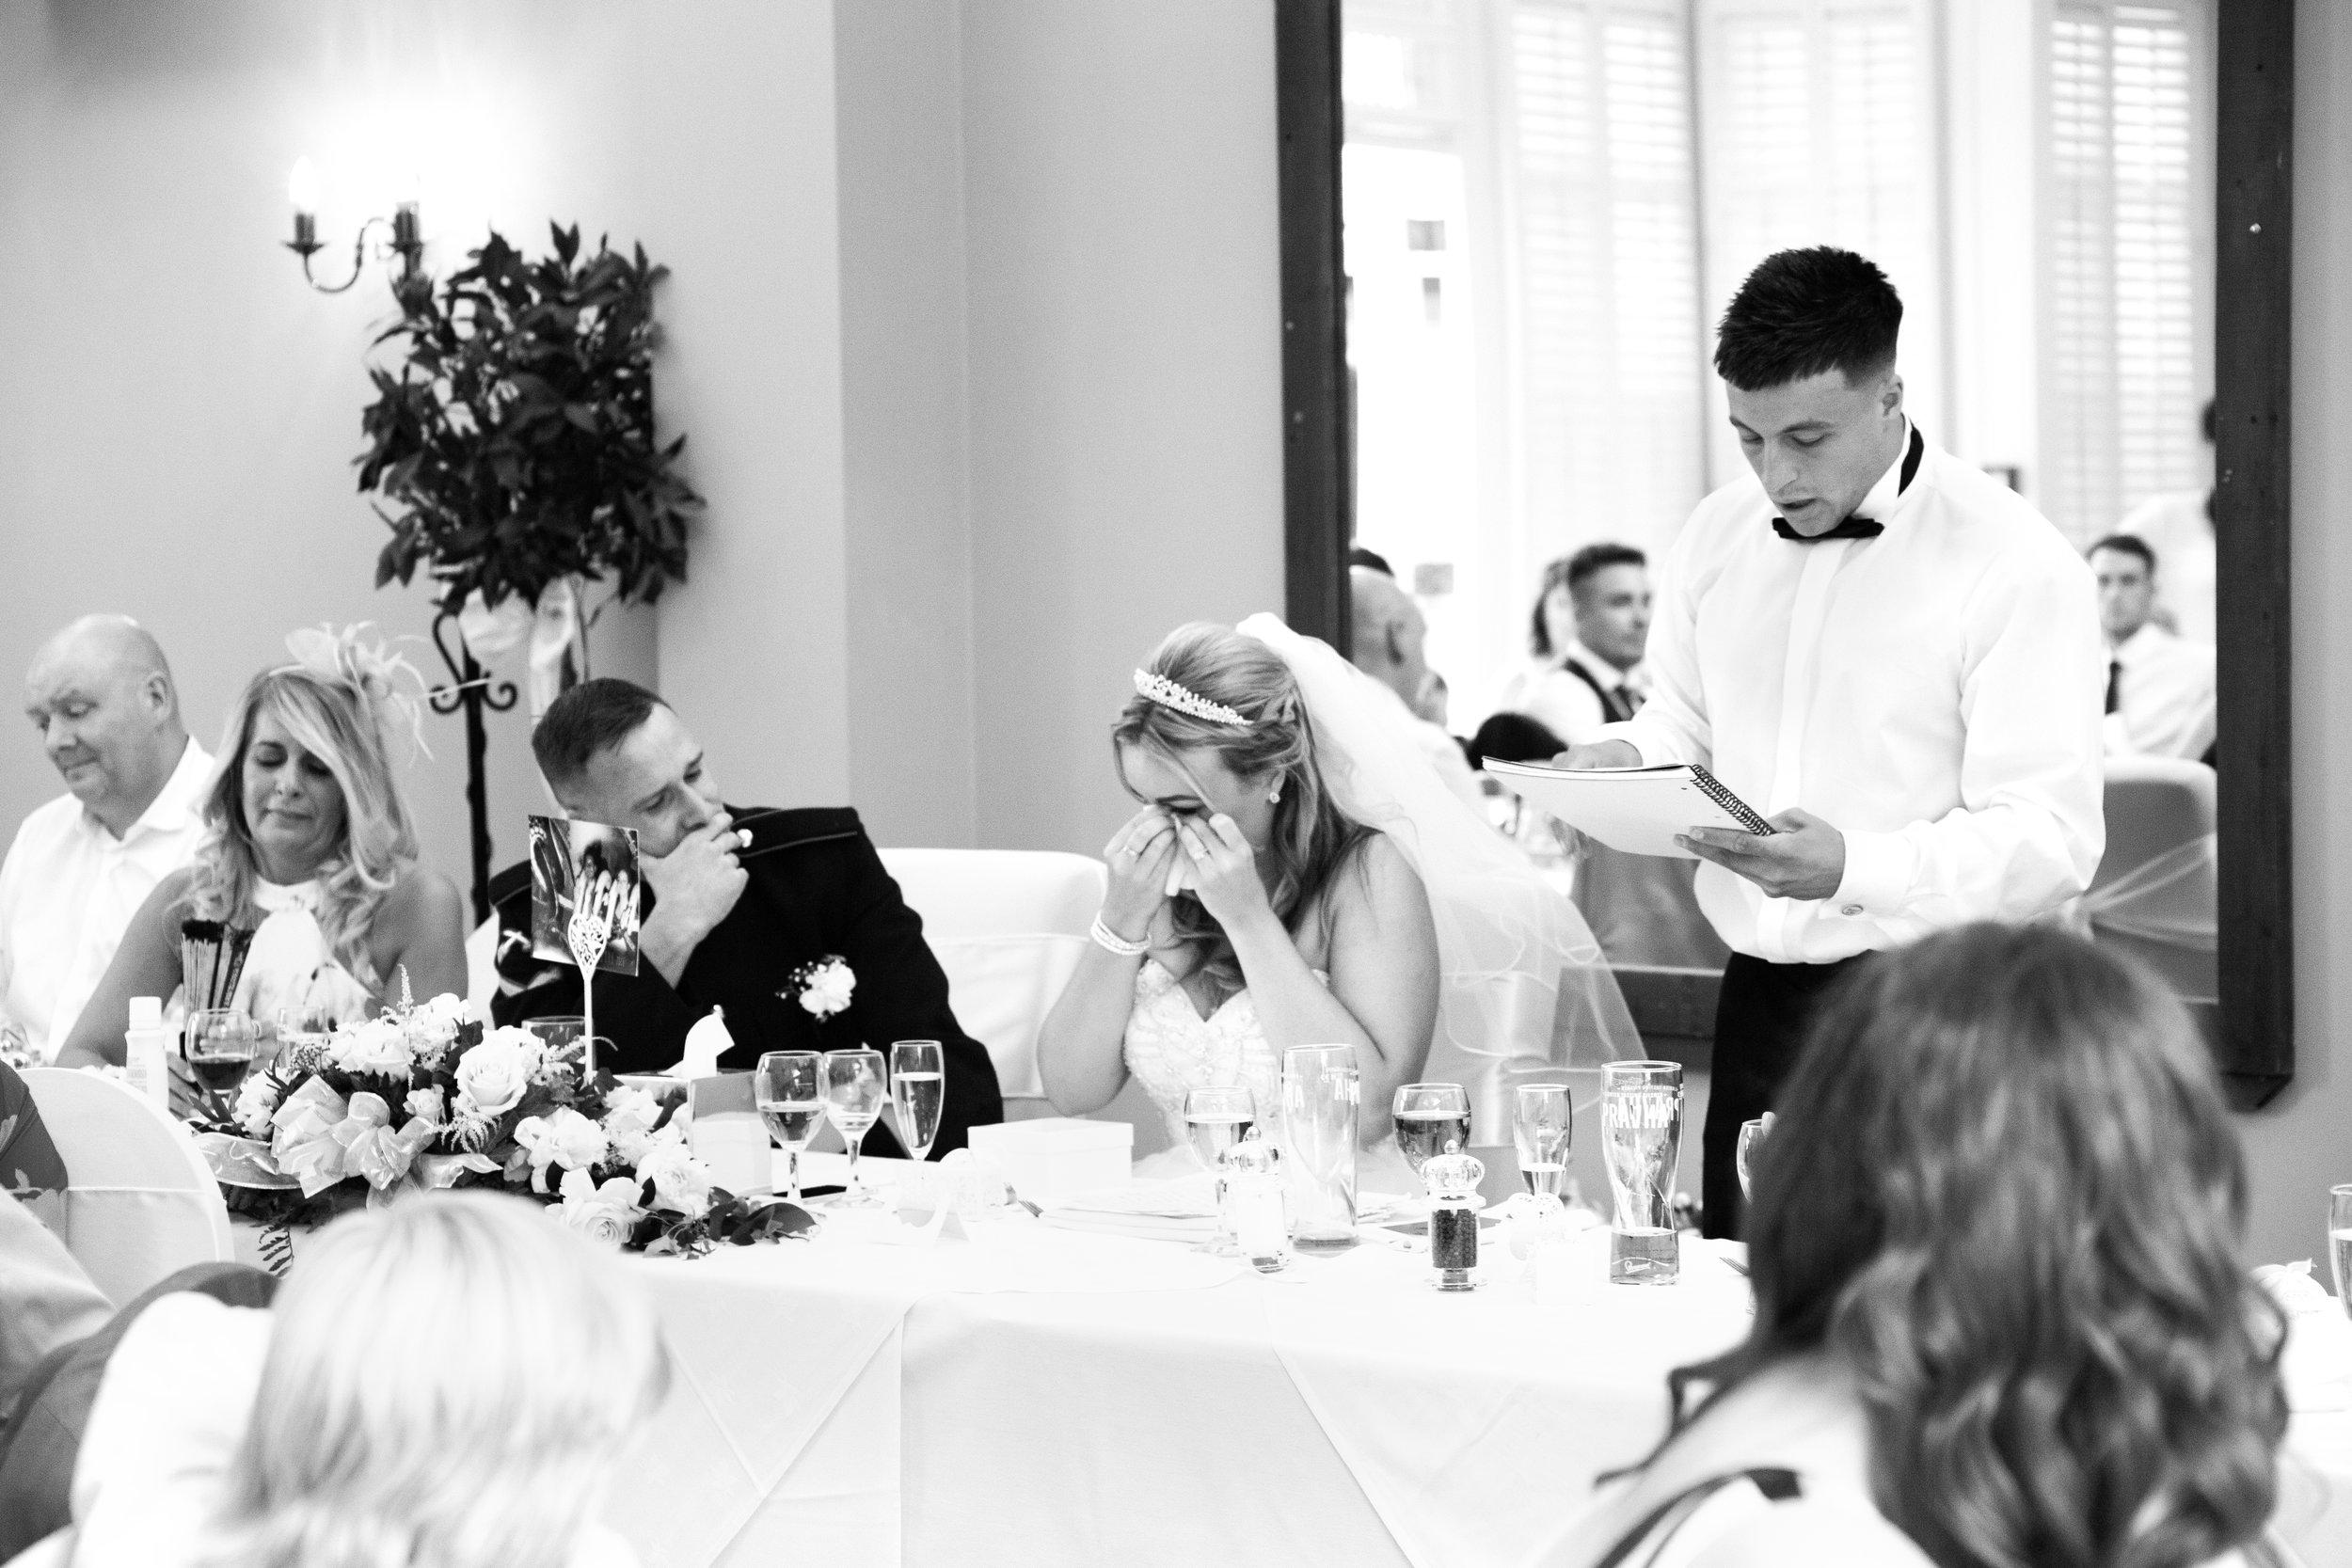 wedding-lea-cooper-photography-willenhall-west-midlands-wolverhampton-dudley-birmingham-uk-marriage-hadley-park-east-telford-speeches-heart-warming.jpg